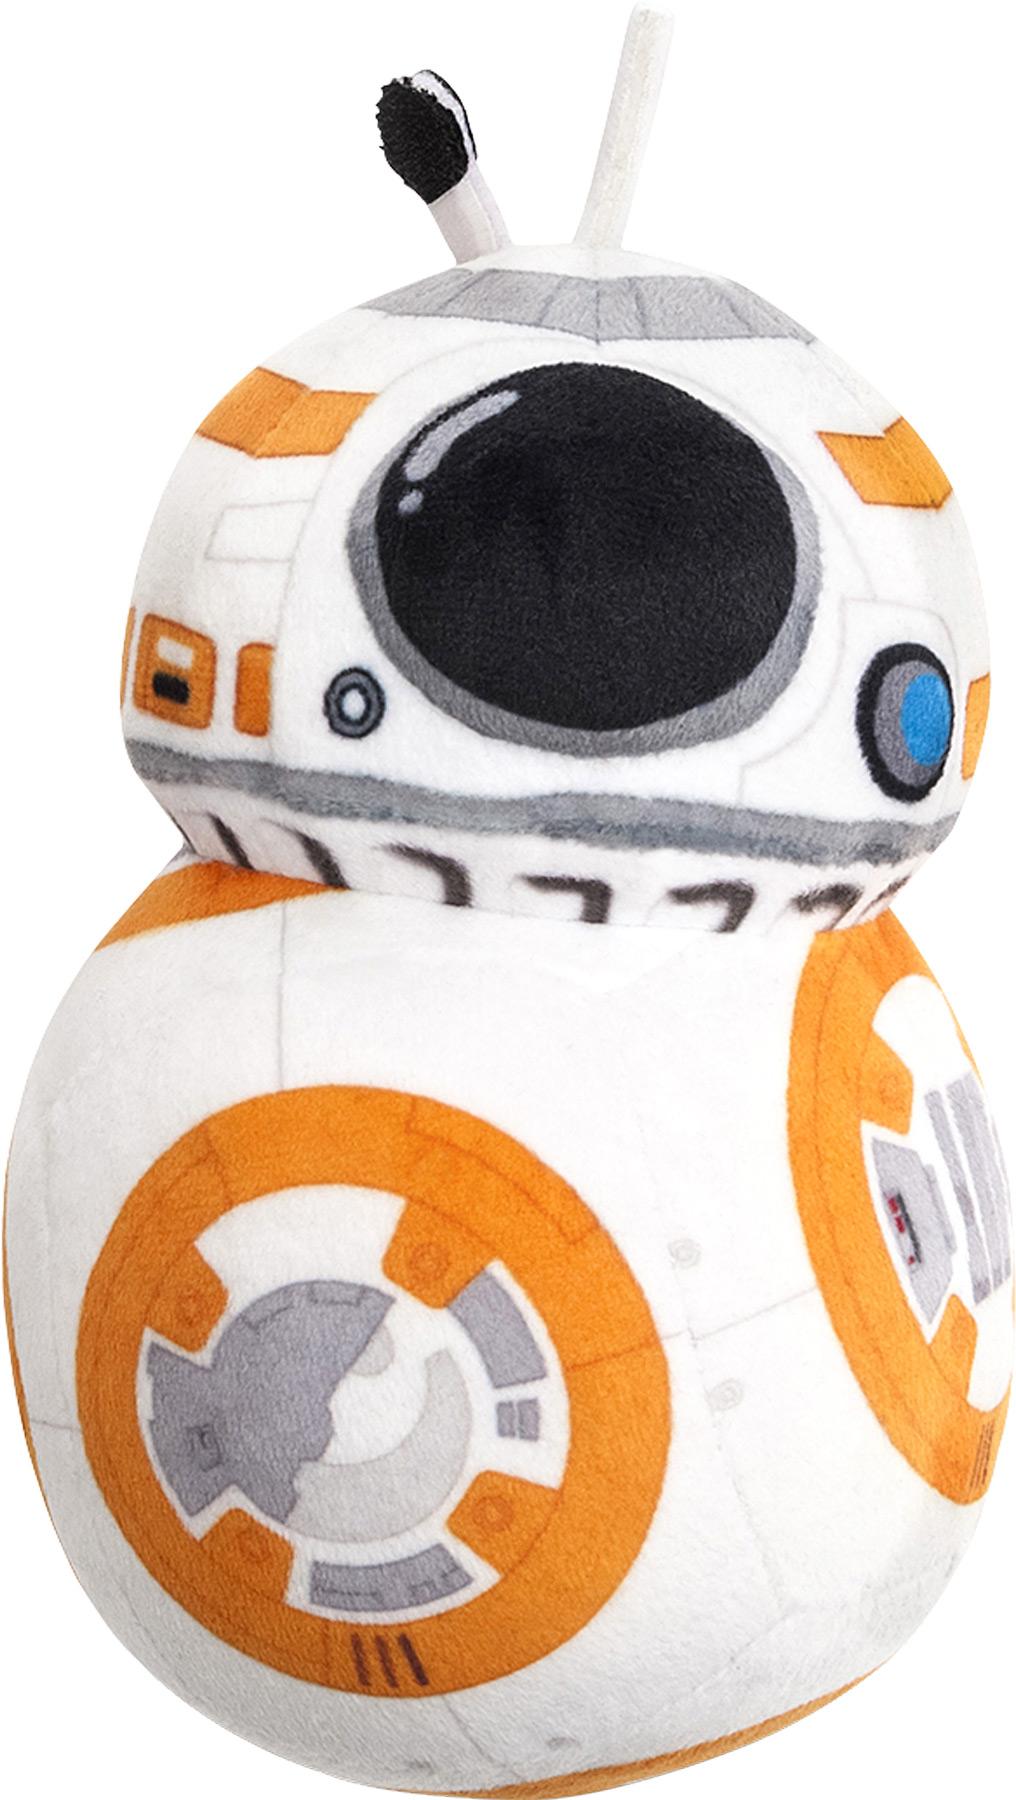 Small Foot Star Wars plyšový BB-8